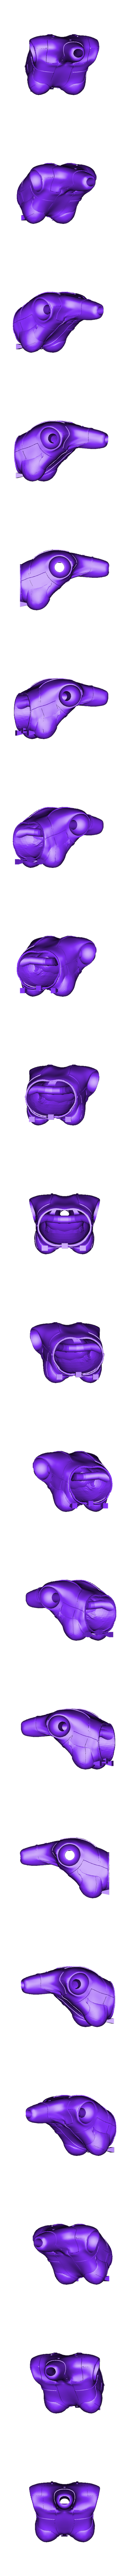 chest busto6.stl Download free STL file Robot woman - Robotica • Model to 3D print, Shira